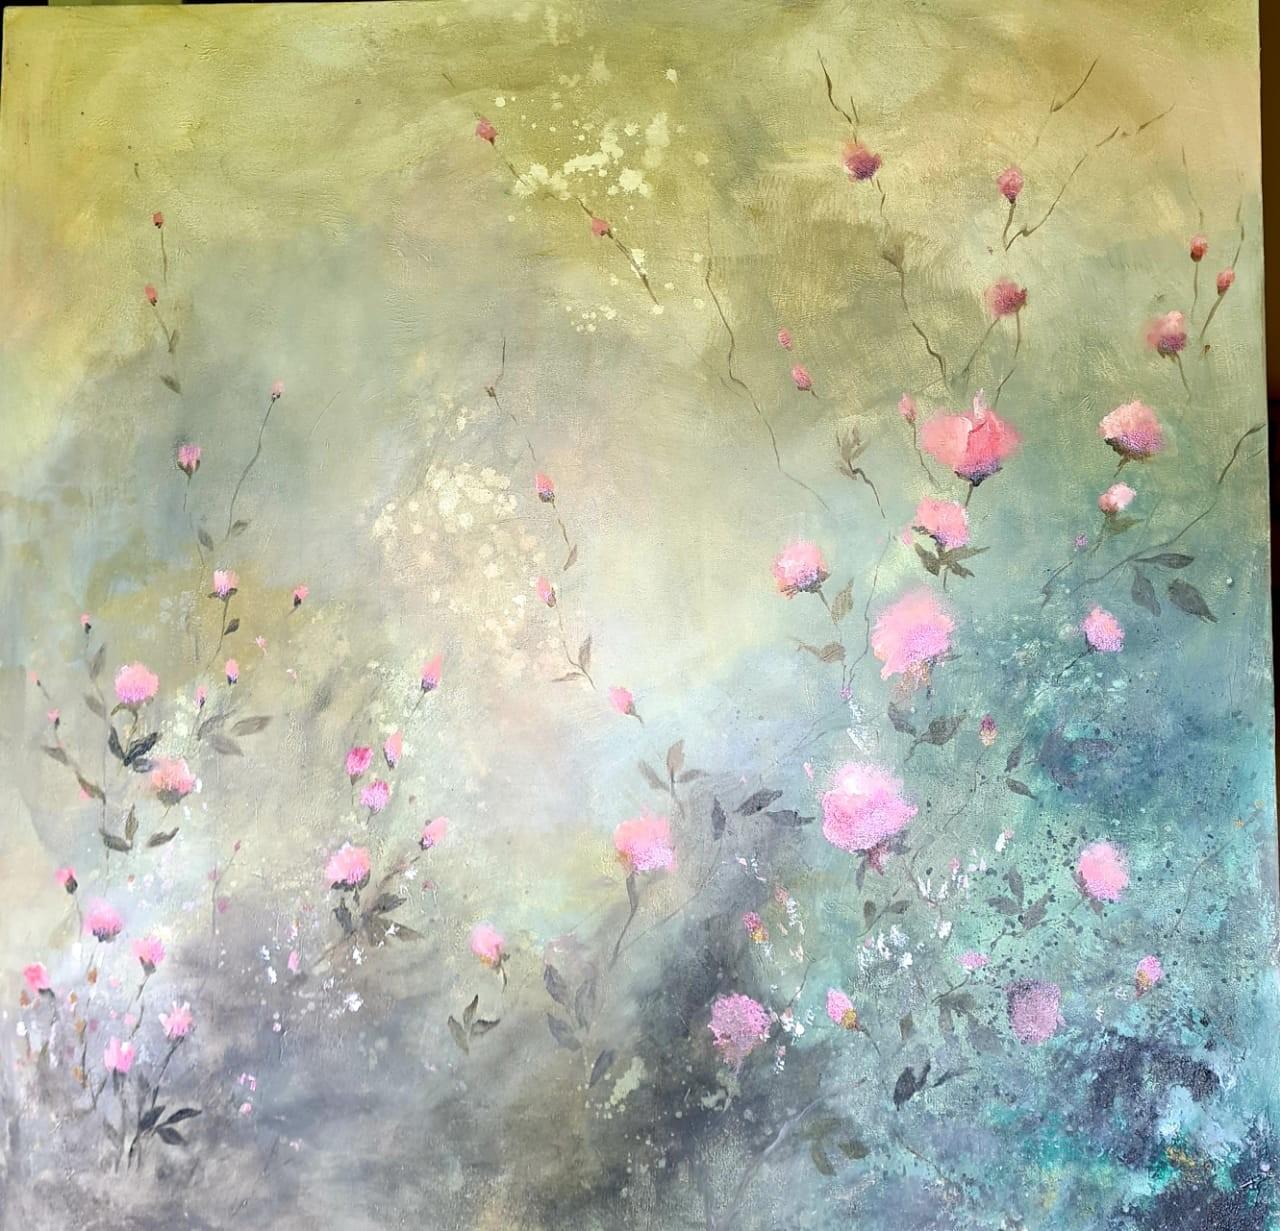 Wild roses by Jean wijesekera